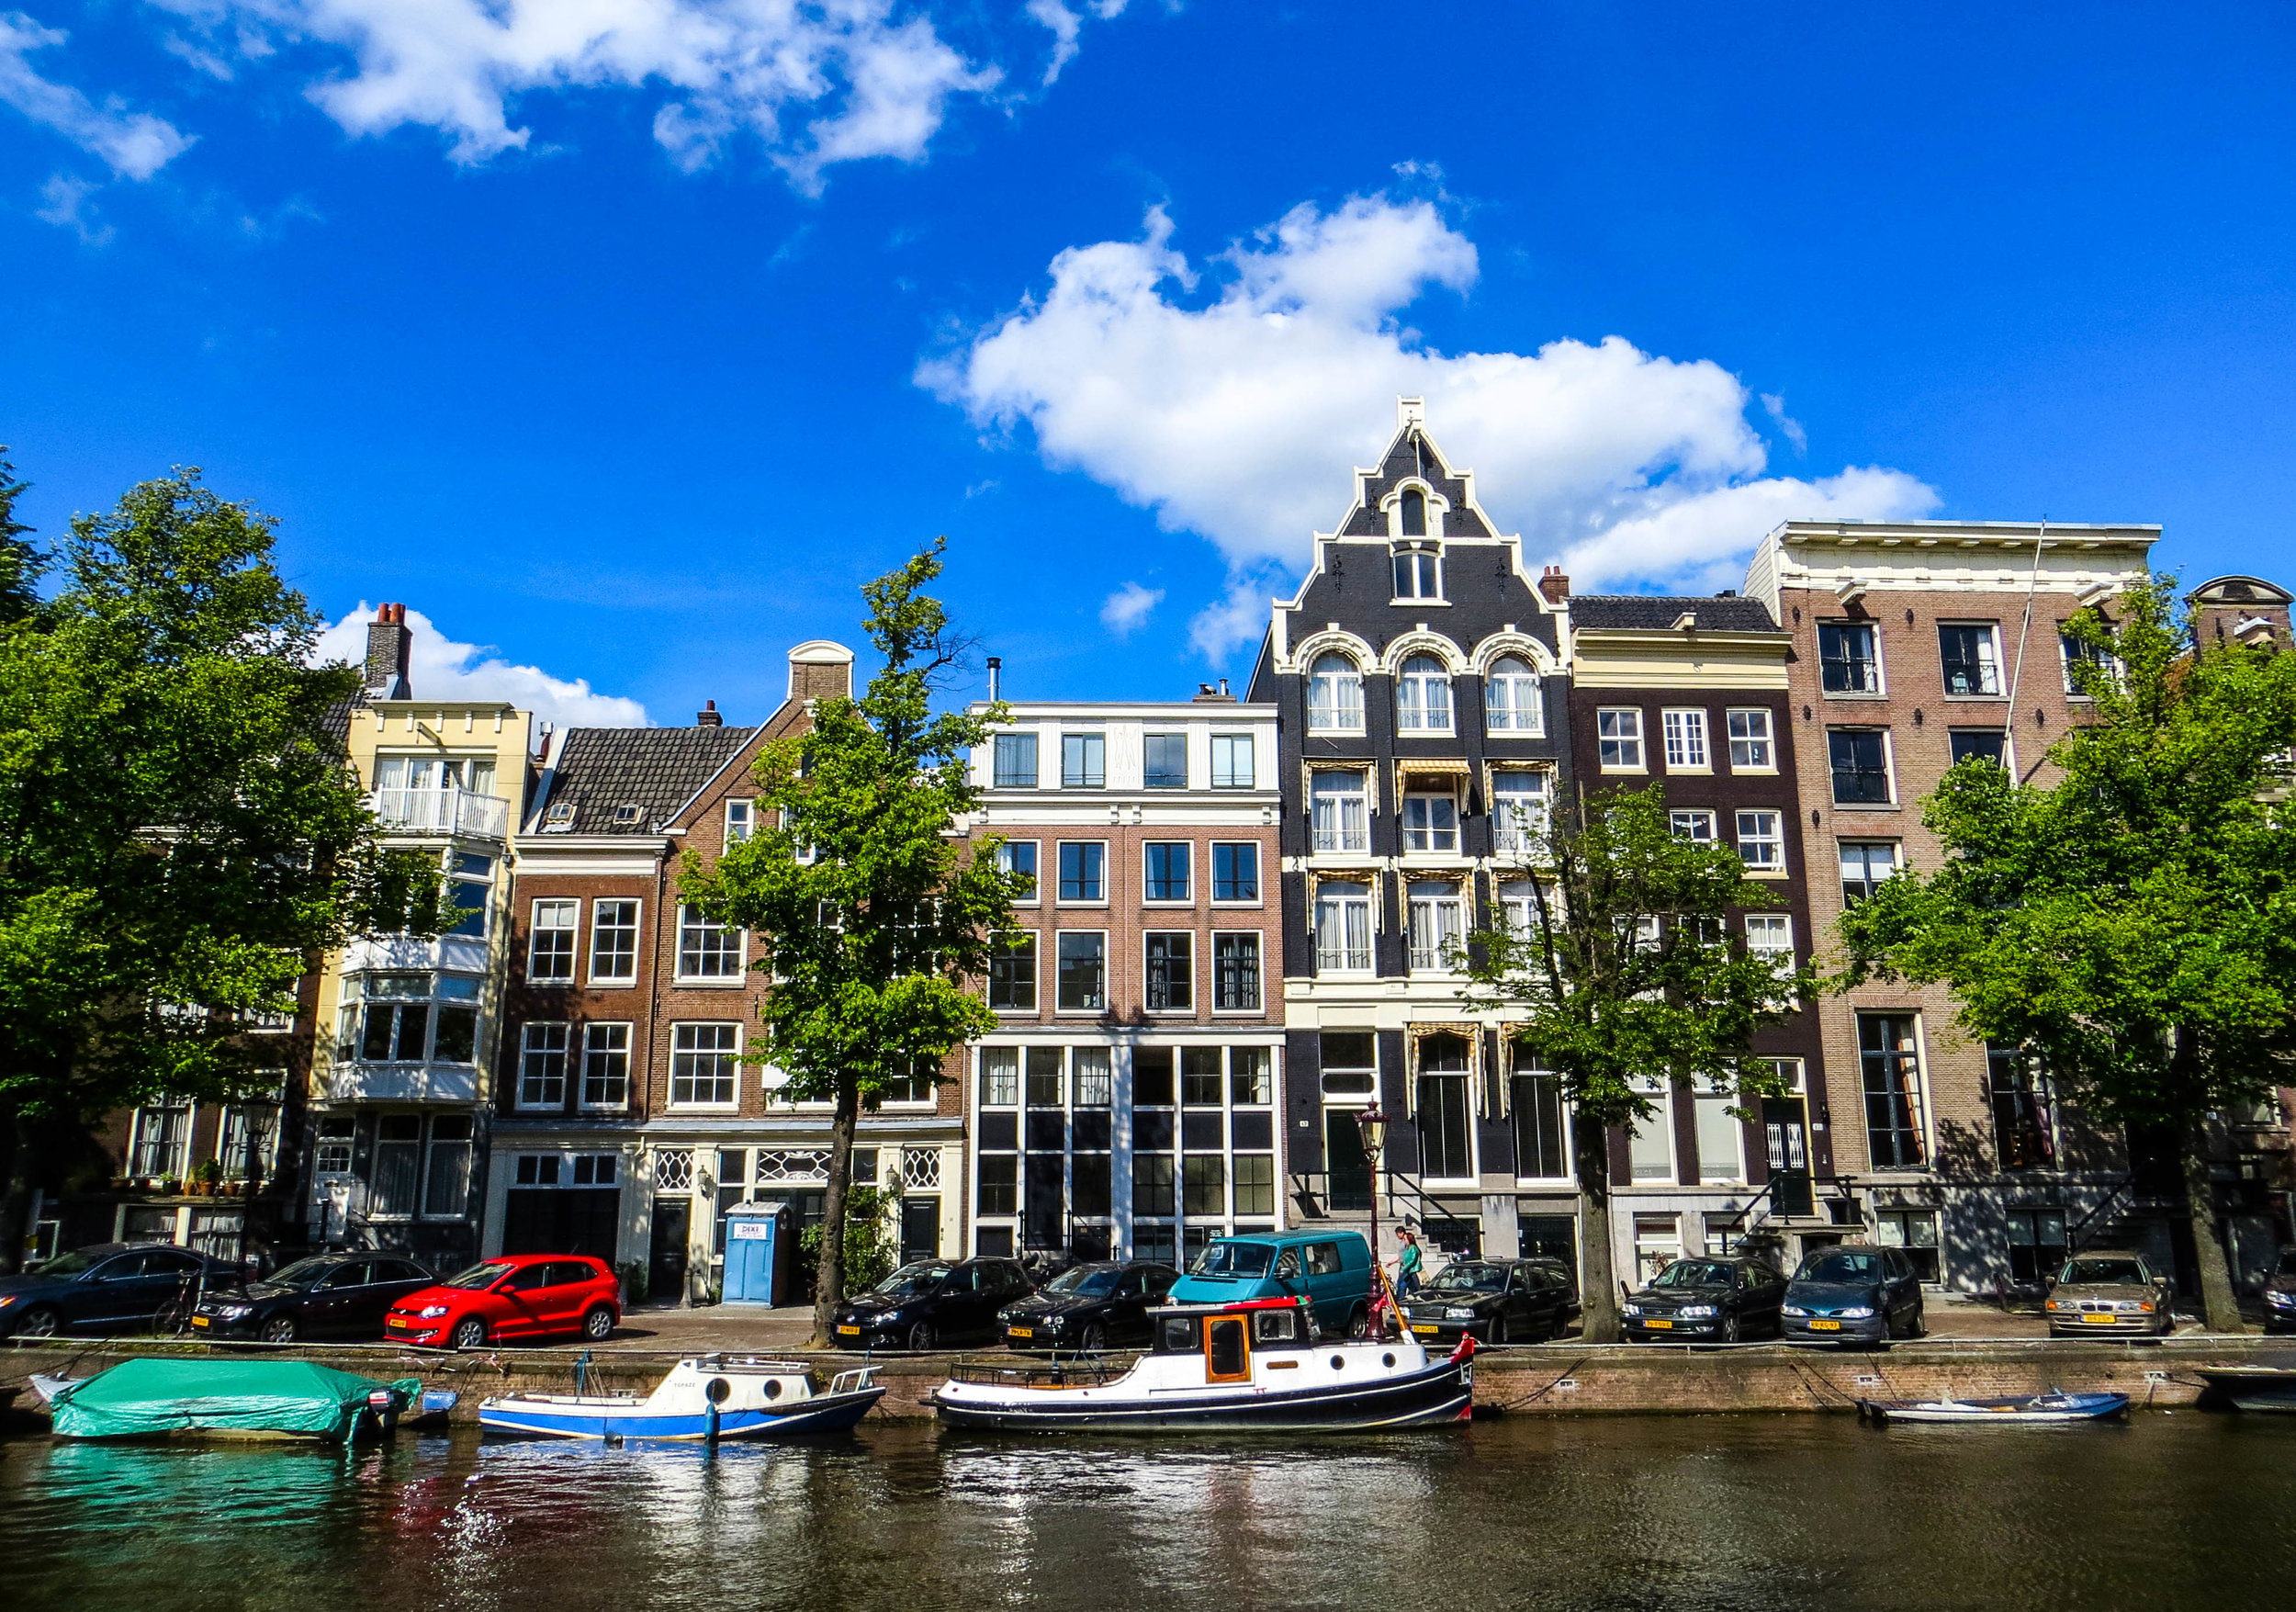 amsterdam-netherlands-street-photography-25.jpg